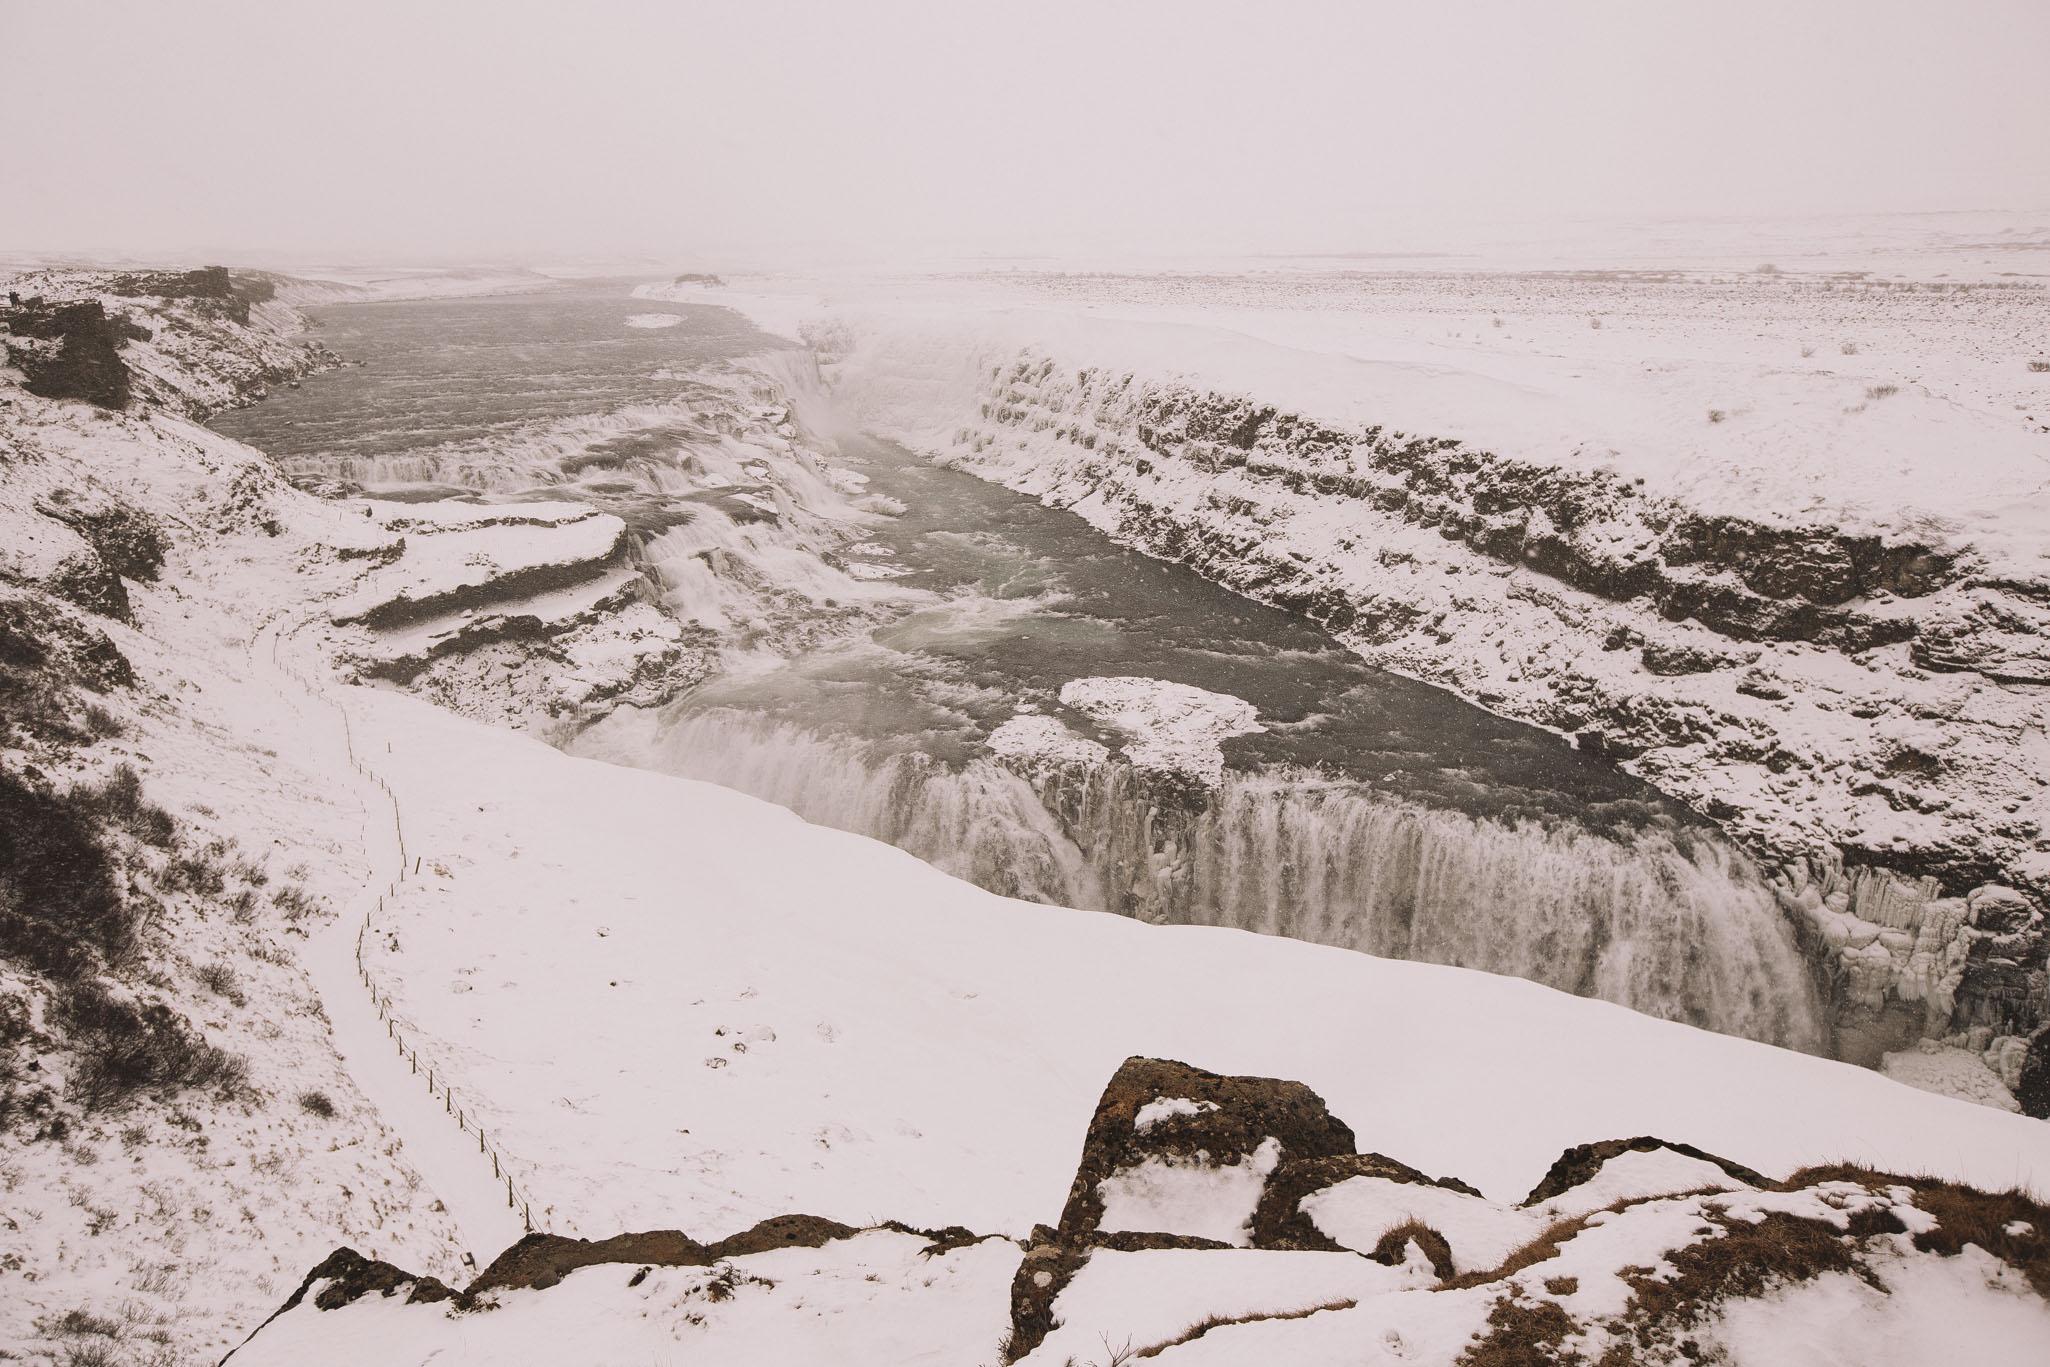 Road-trip-Islande-Iceland-Voyage-Travel-Portrait-Jérémy-Boyer-Geysir-Geysers-Horse-snow-ice-Gullfoss-8.jpg